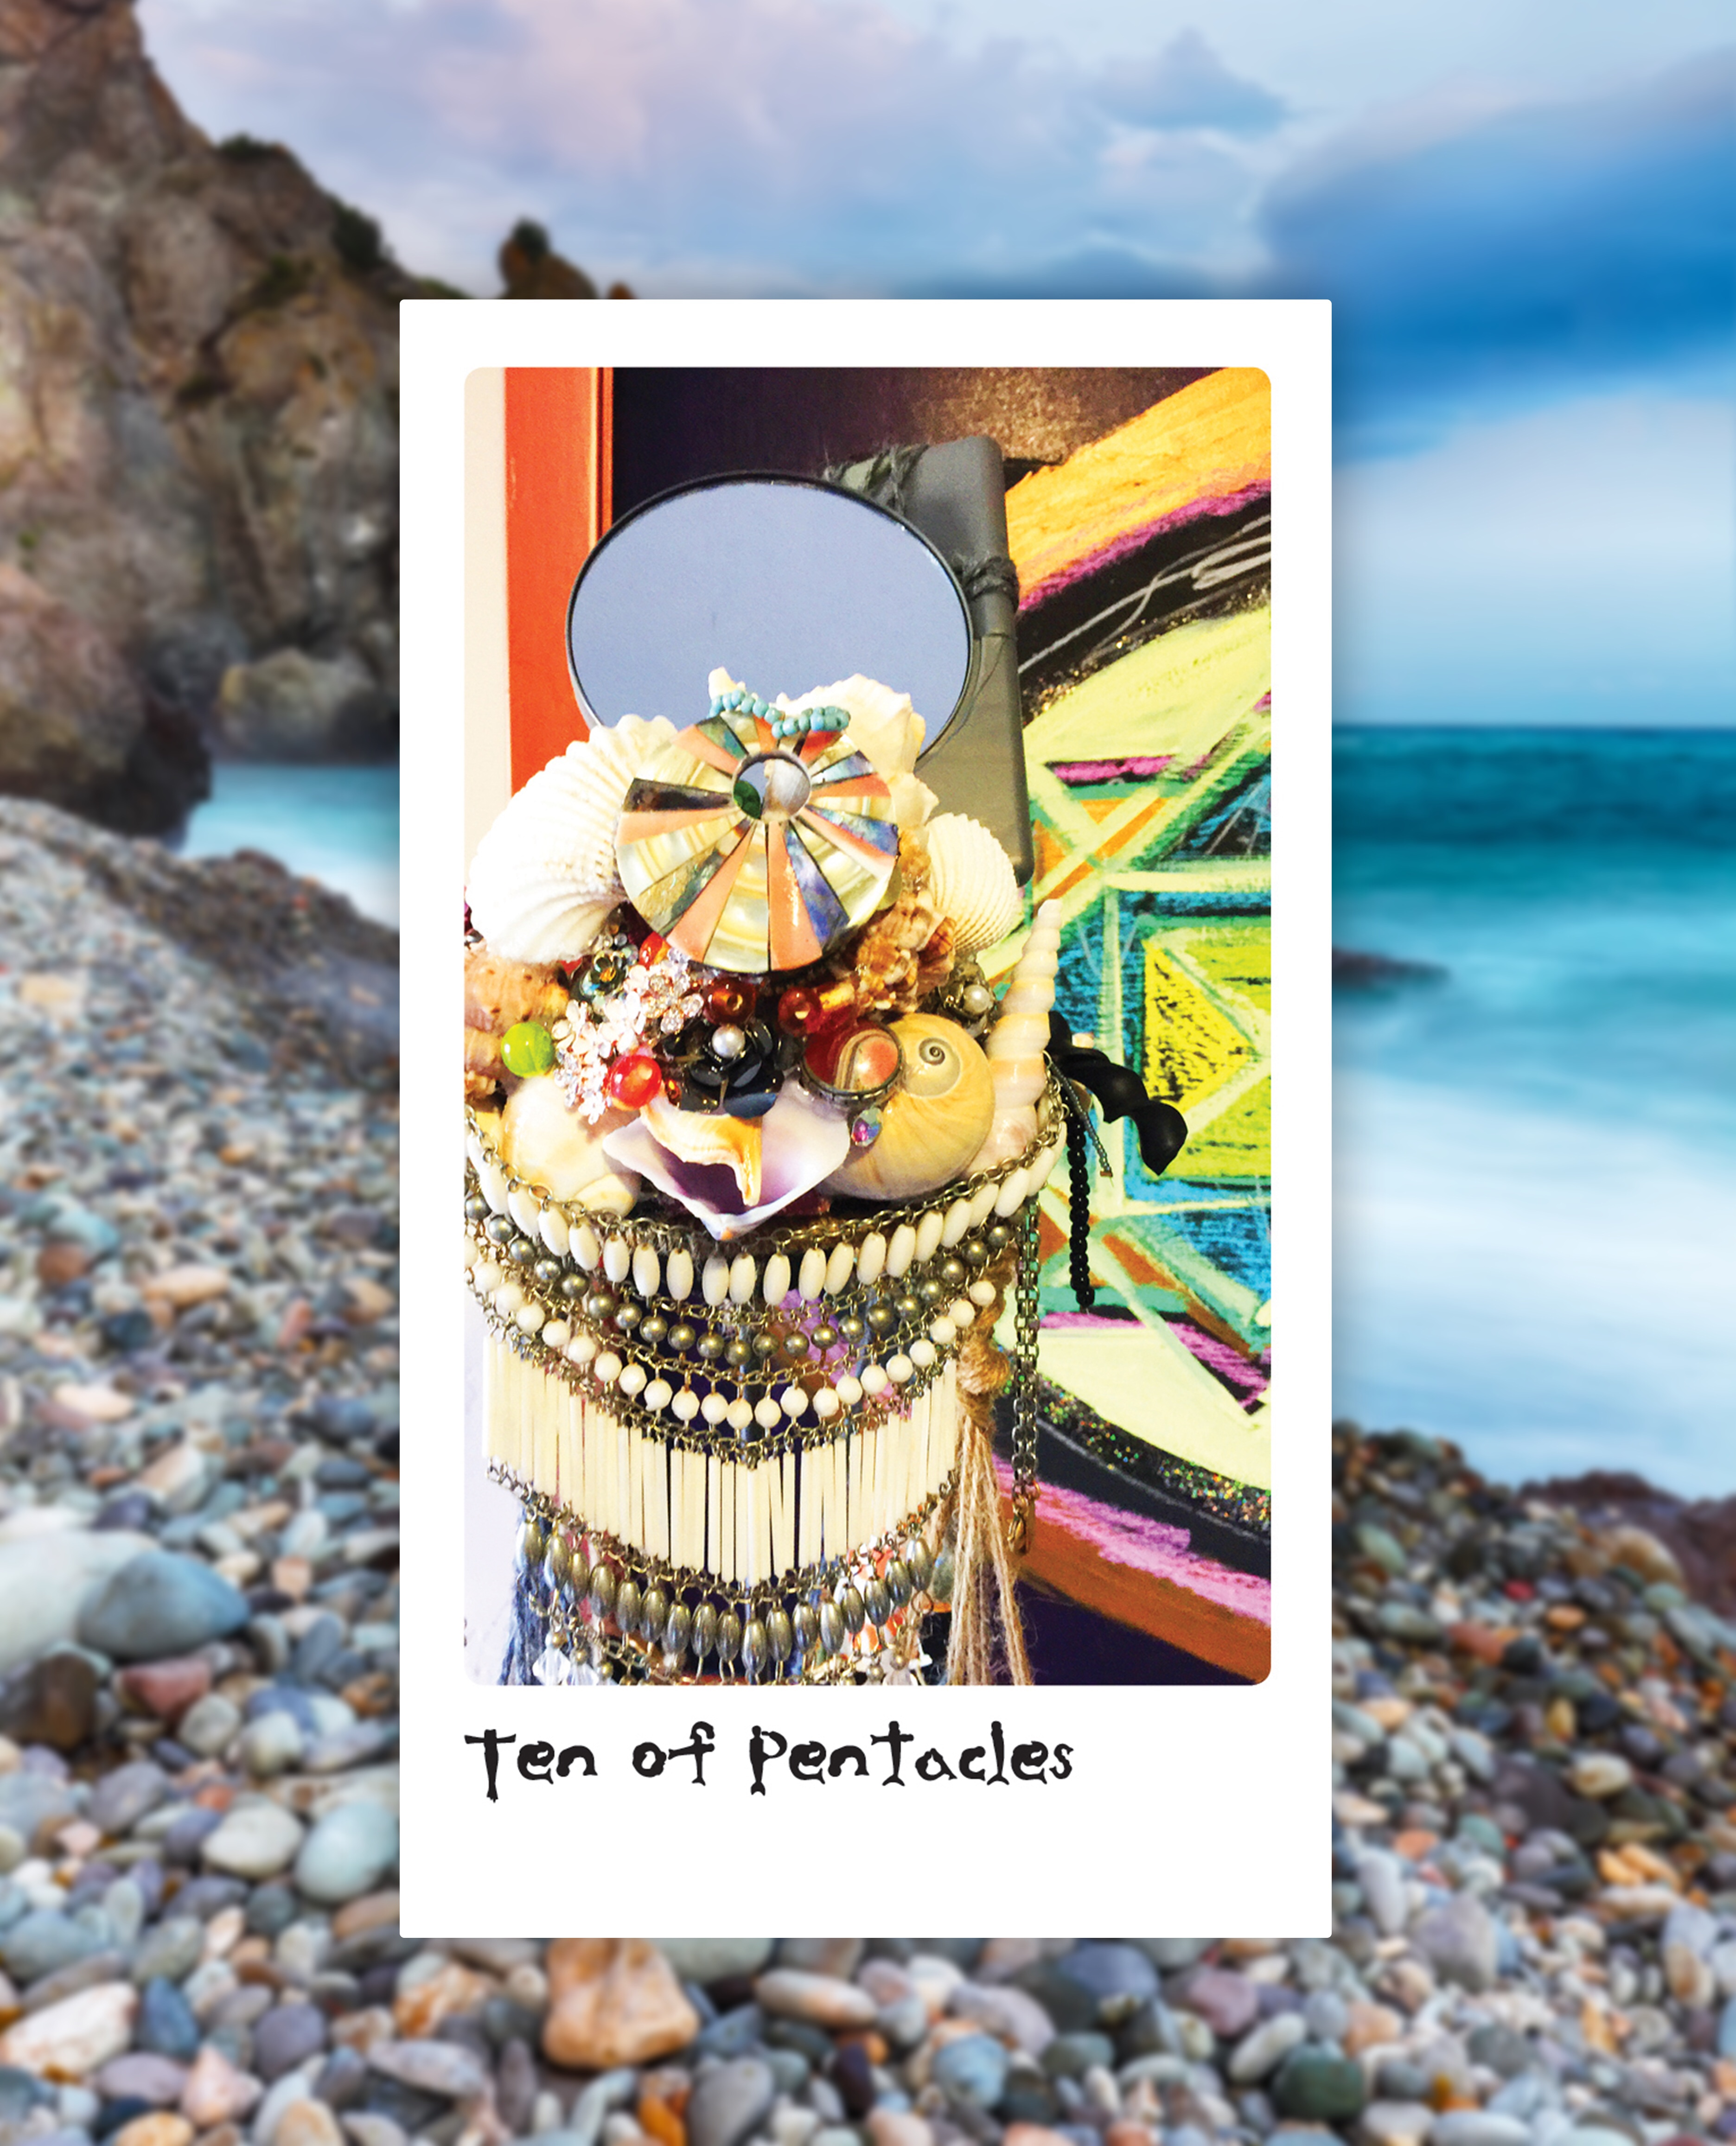 ten of pentacles mermaid type tarot